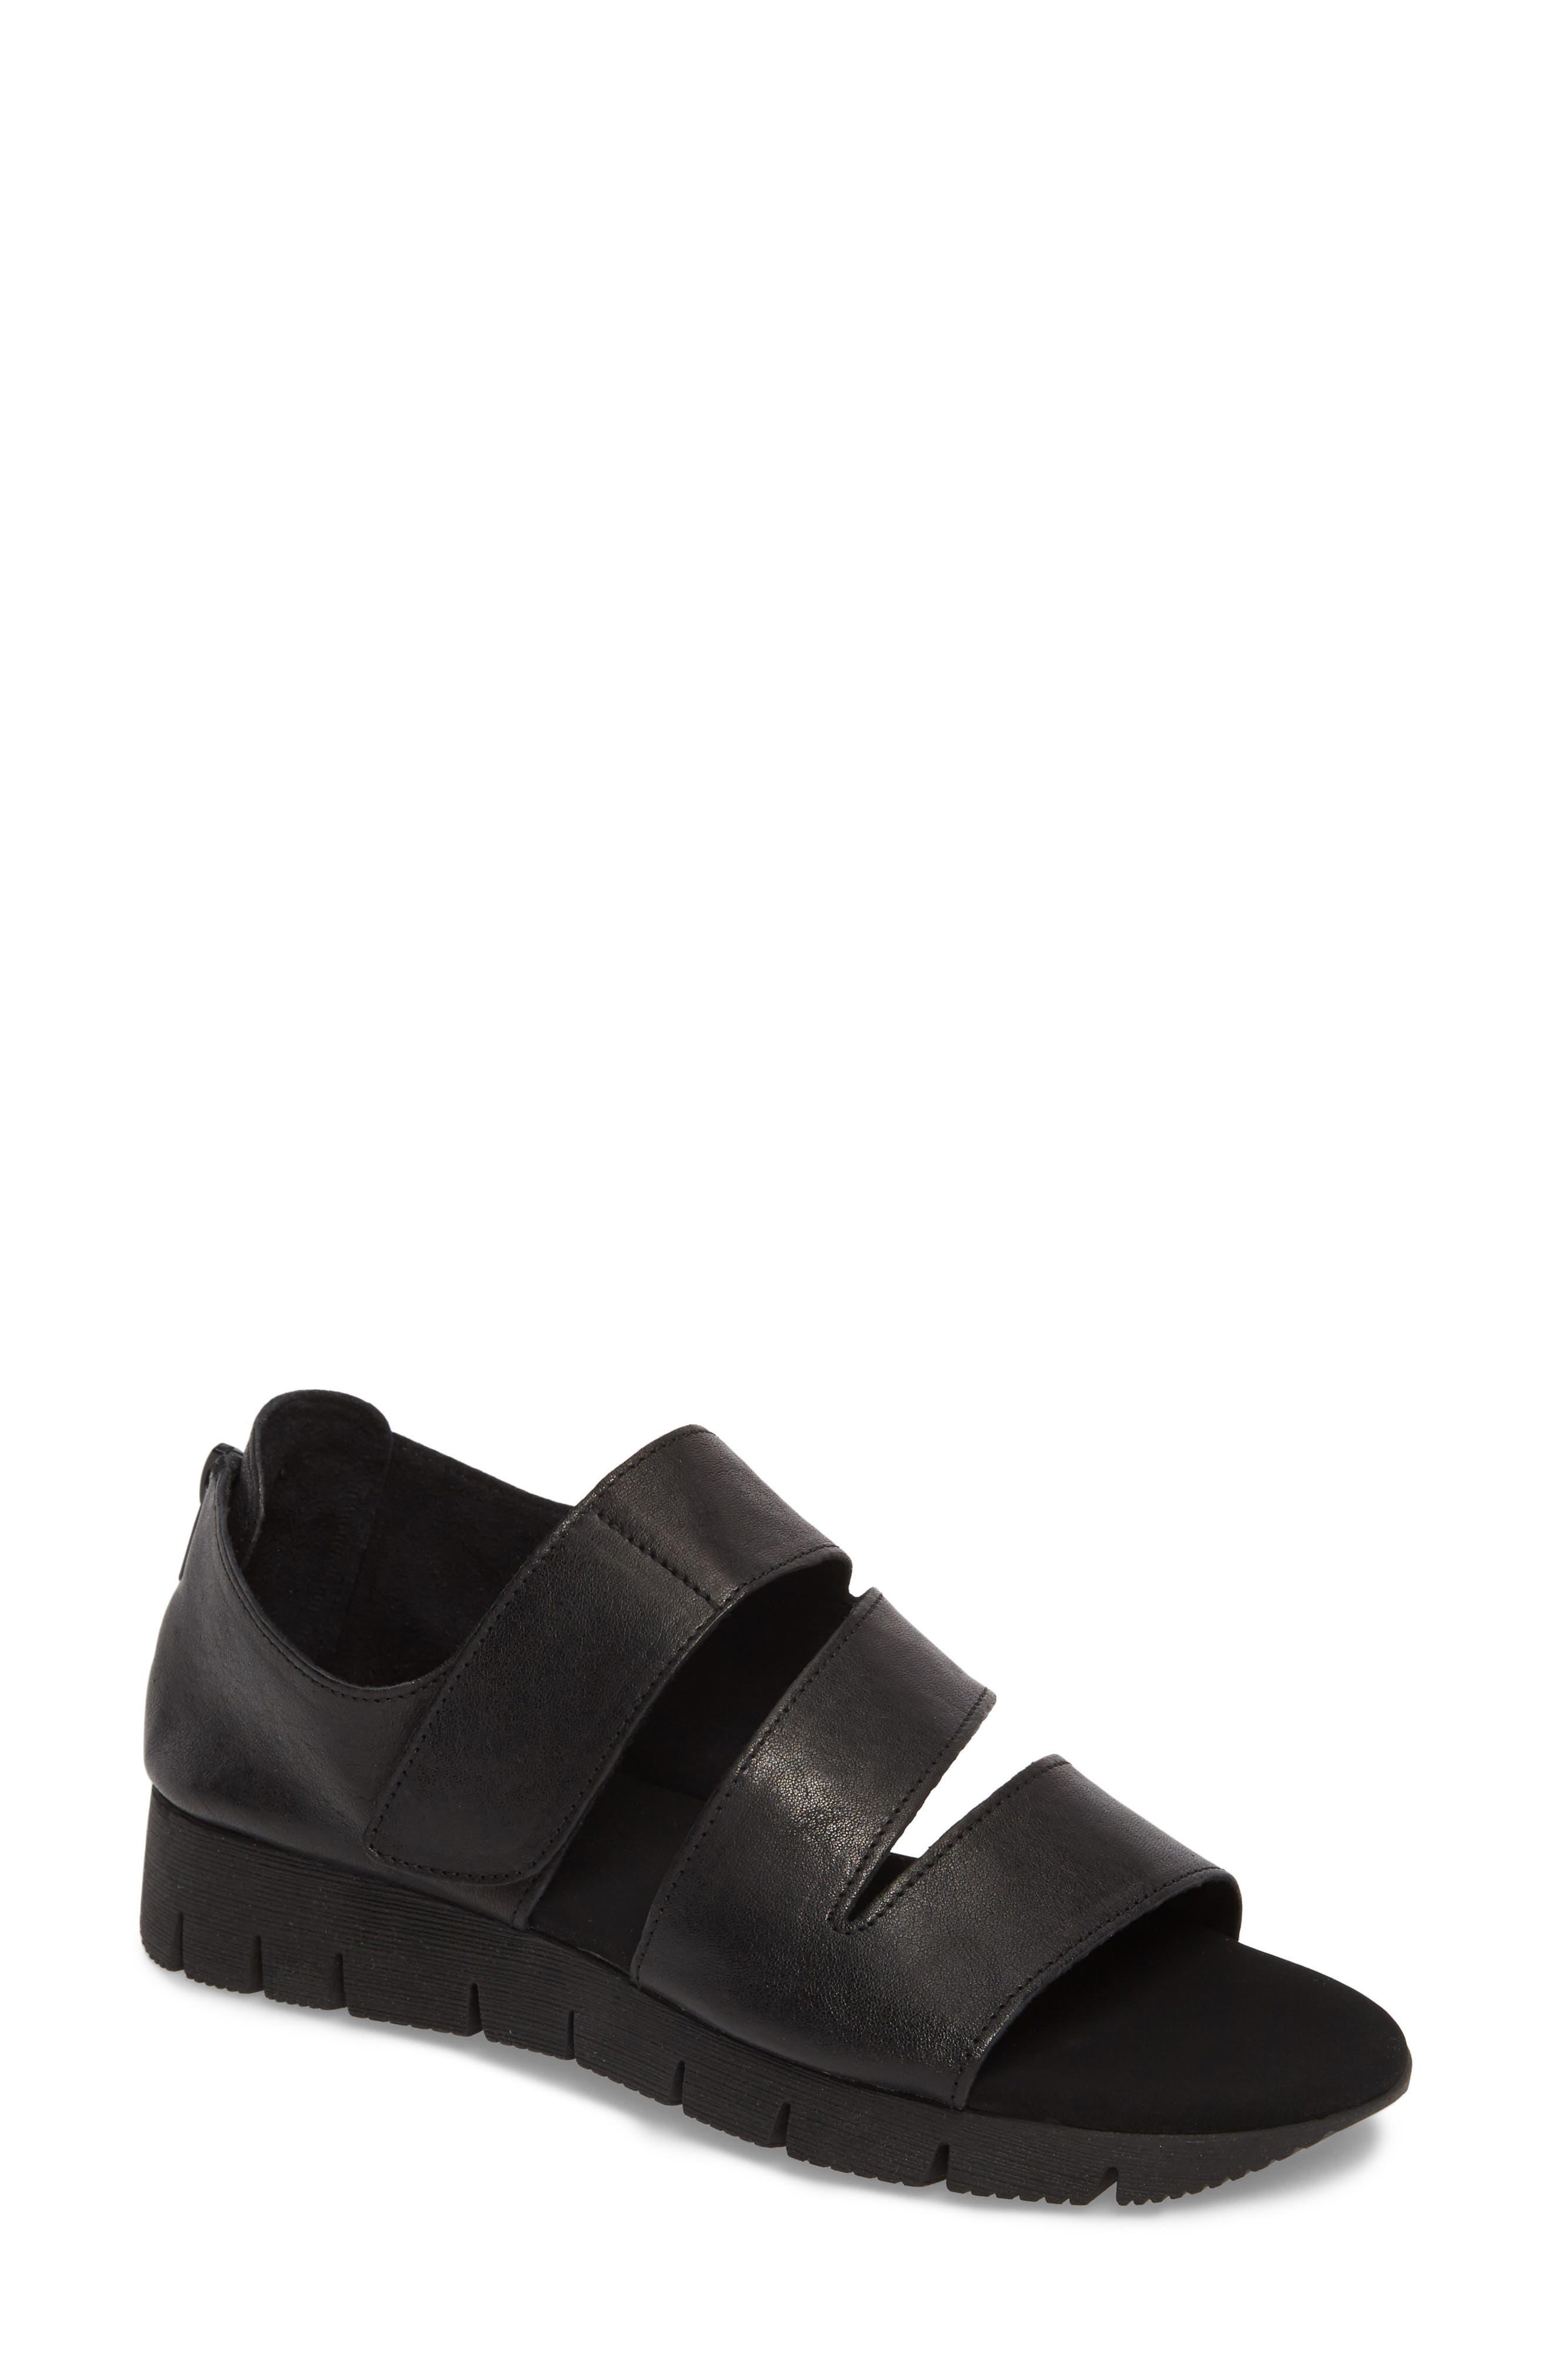 Tango Sandal,                         Main,                         color, Black Rock/ Tory Black Rubber